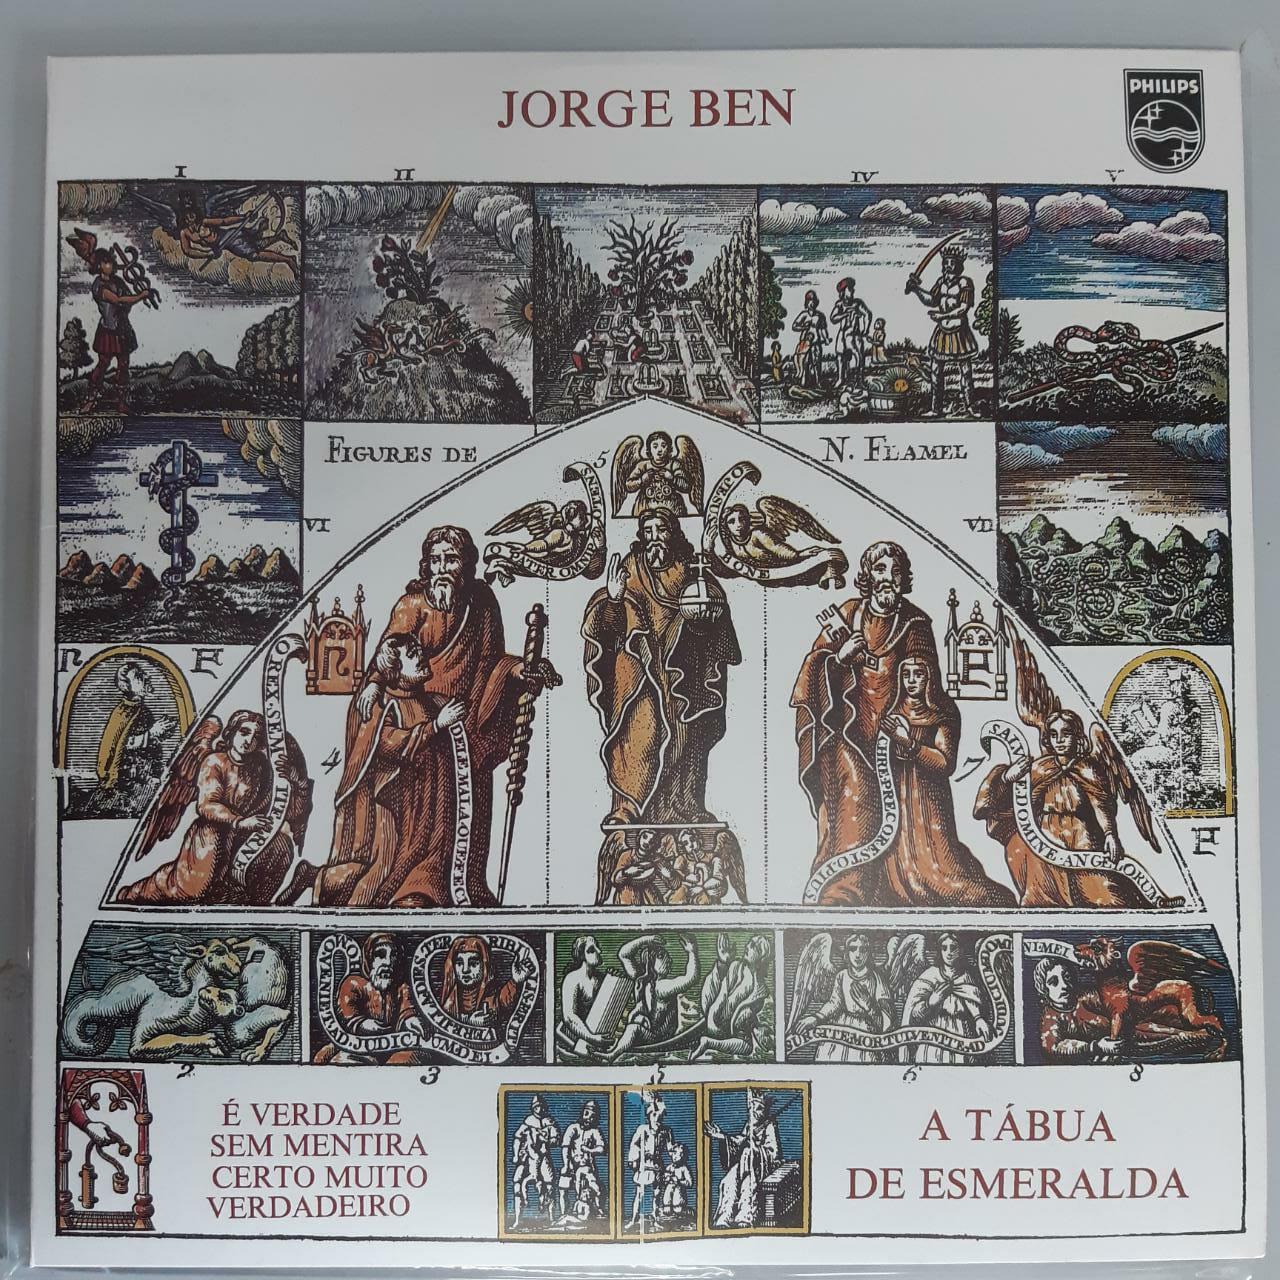 Lp Vinil Jorge Ben A Tabua De Esmeralda NÃO LACRADO